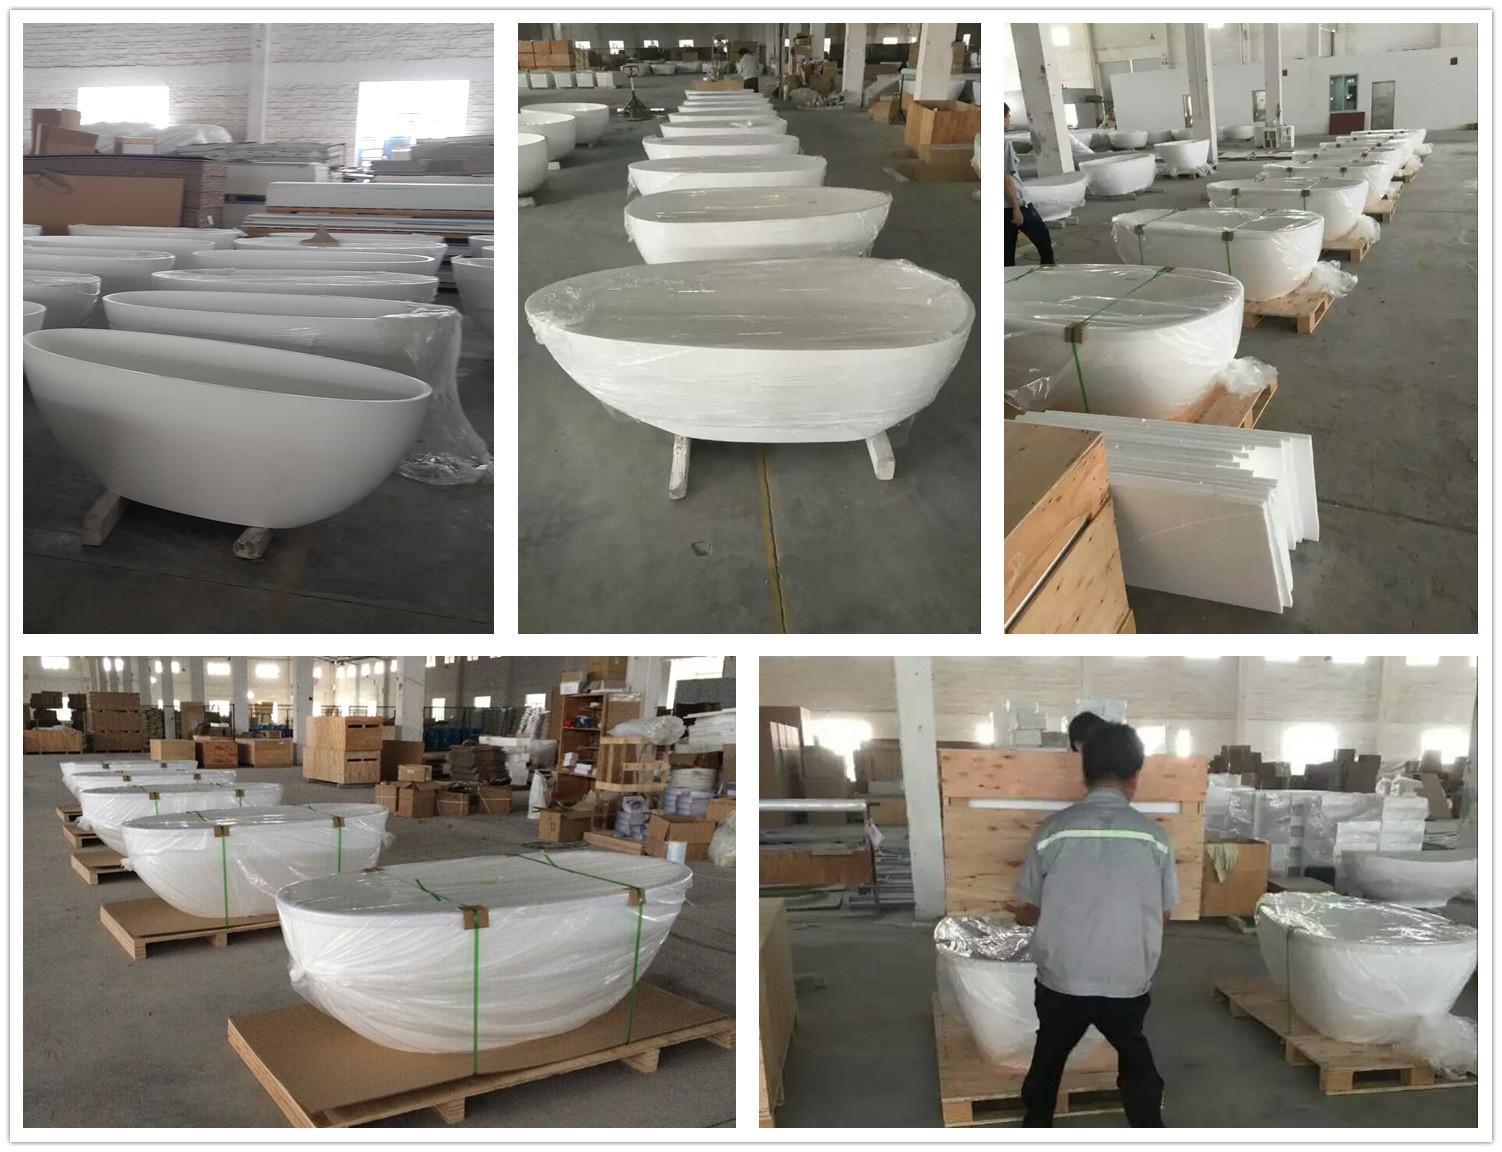 Bellissimo-Stone resin solid surface design freestanding floor mounted bathtub-9